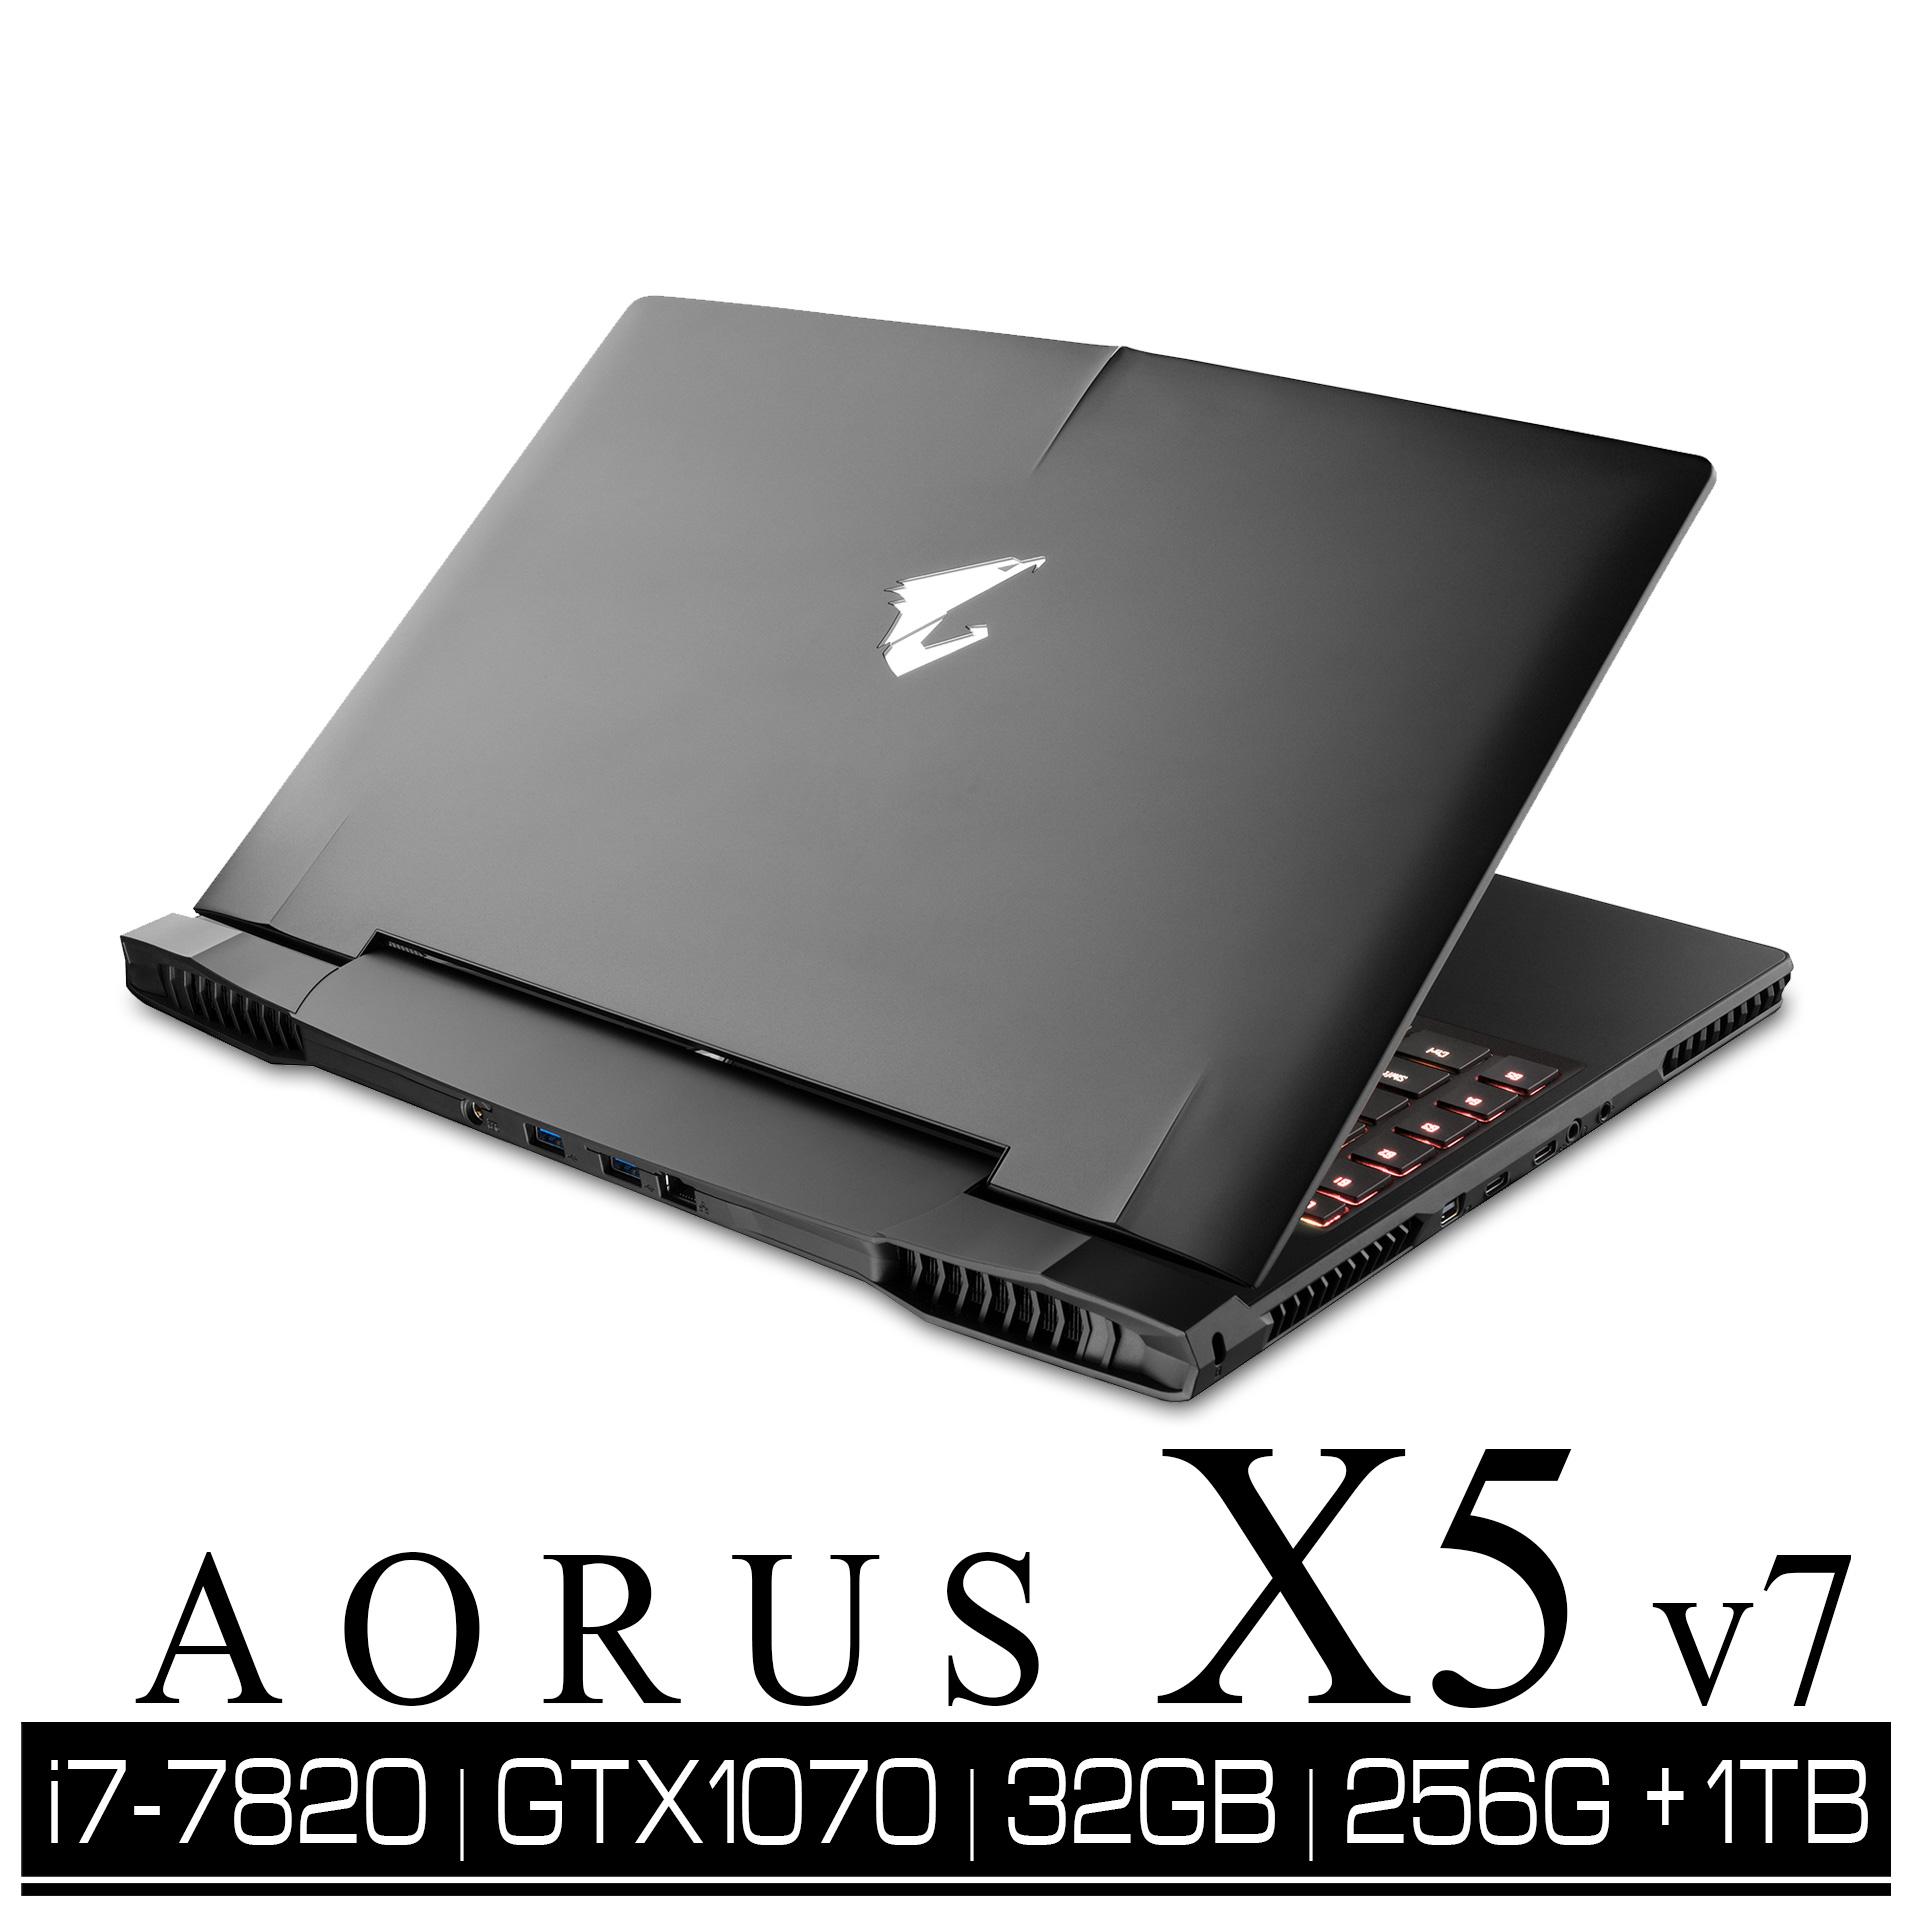 AORUS X5 v7 電競筆電/i7-7820HK/32GB/GTX1070/256GB+1TB